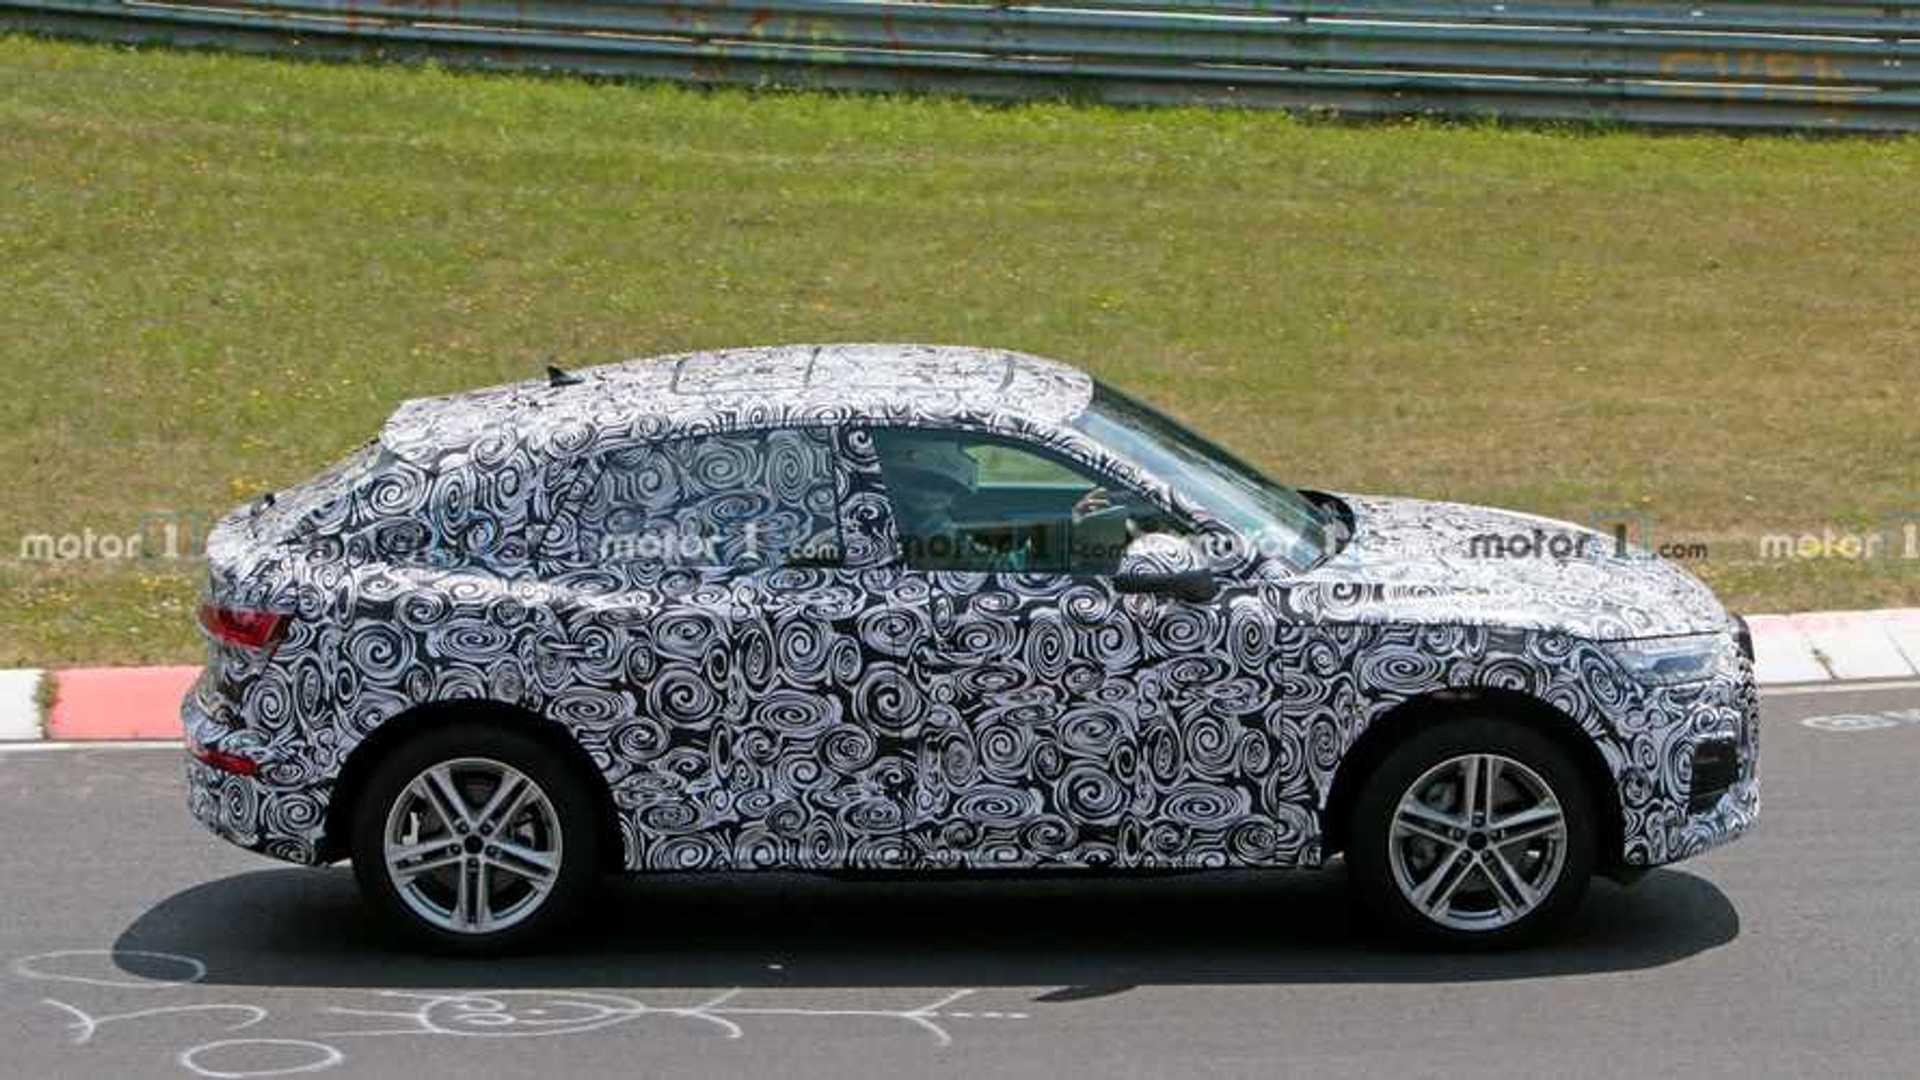 2020 - [Audi] Q5 Sportback - Page 7 2021-audi-q5-sportback-spy-photo-side